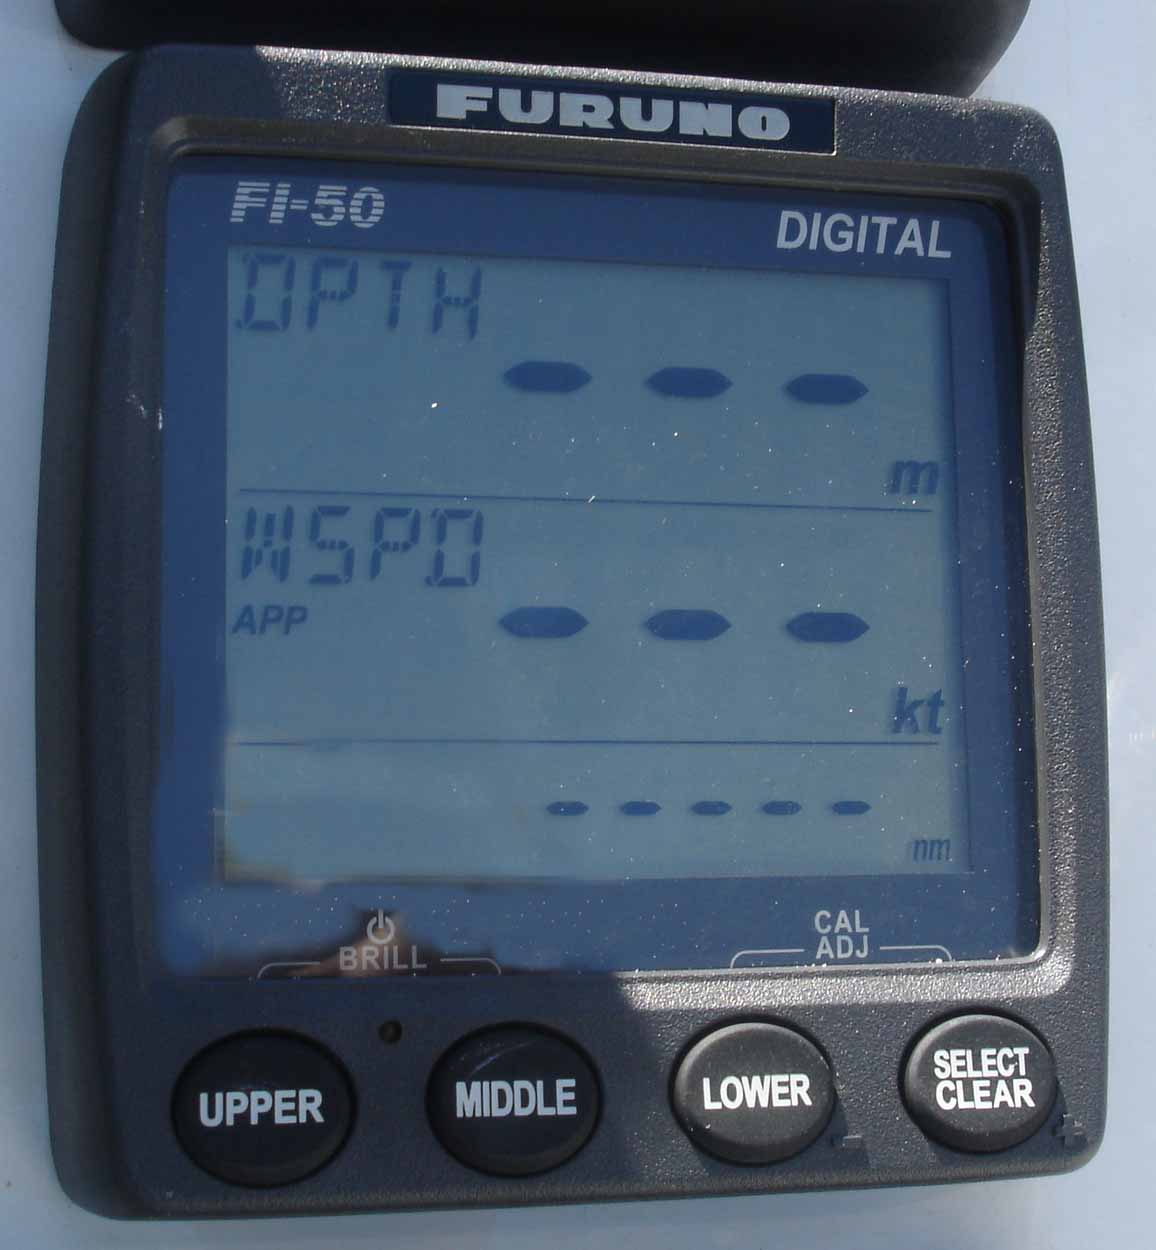 Click image for larger version  Name:Furuno log.JPG Views:74 Size:102.6 KB ID:15078